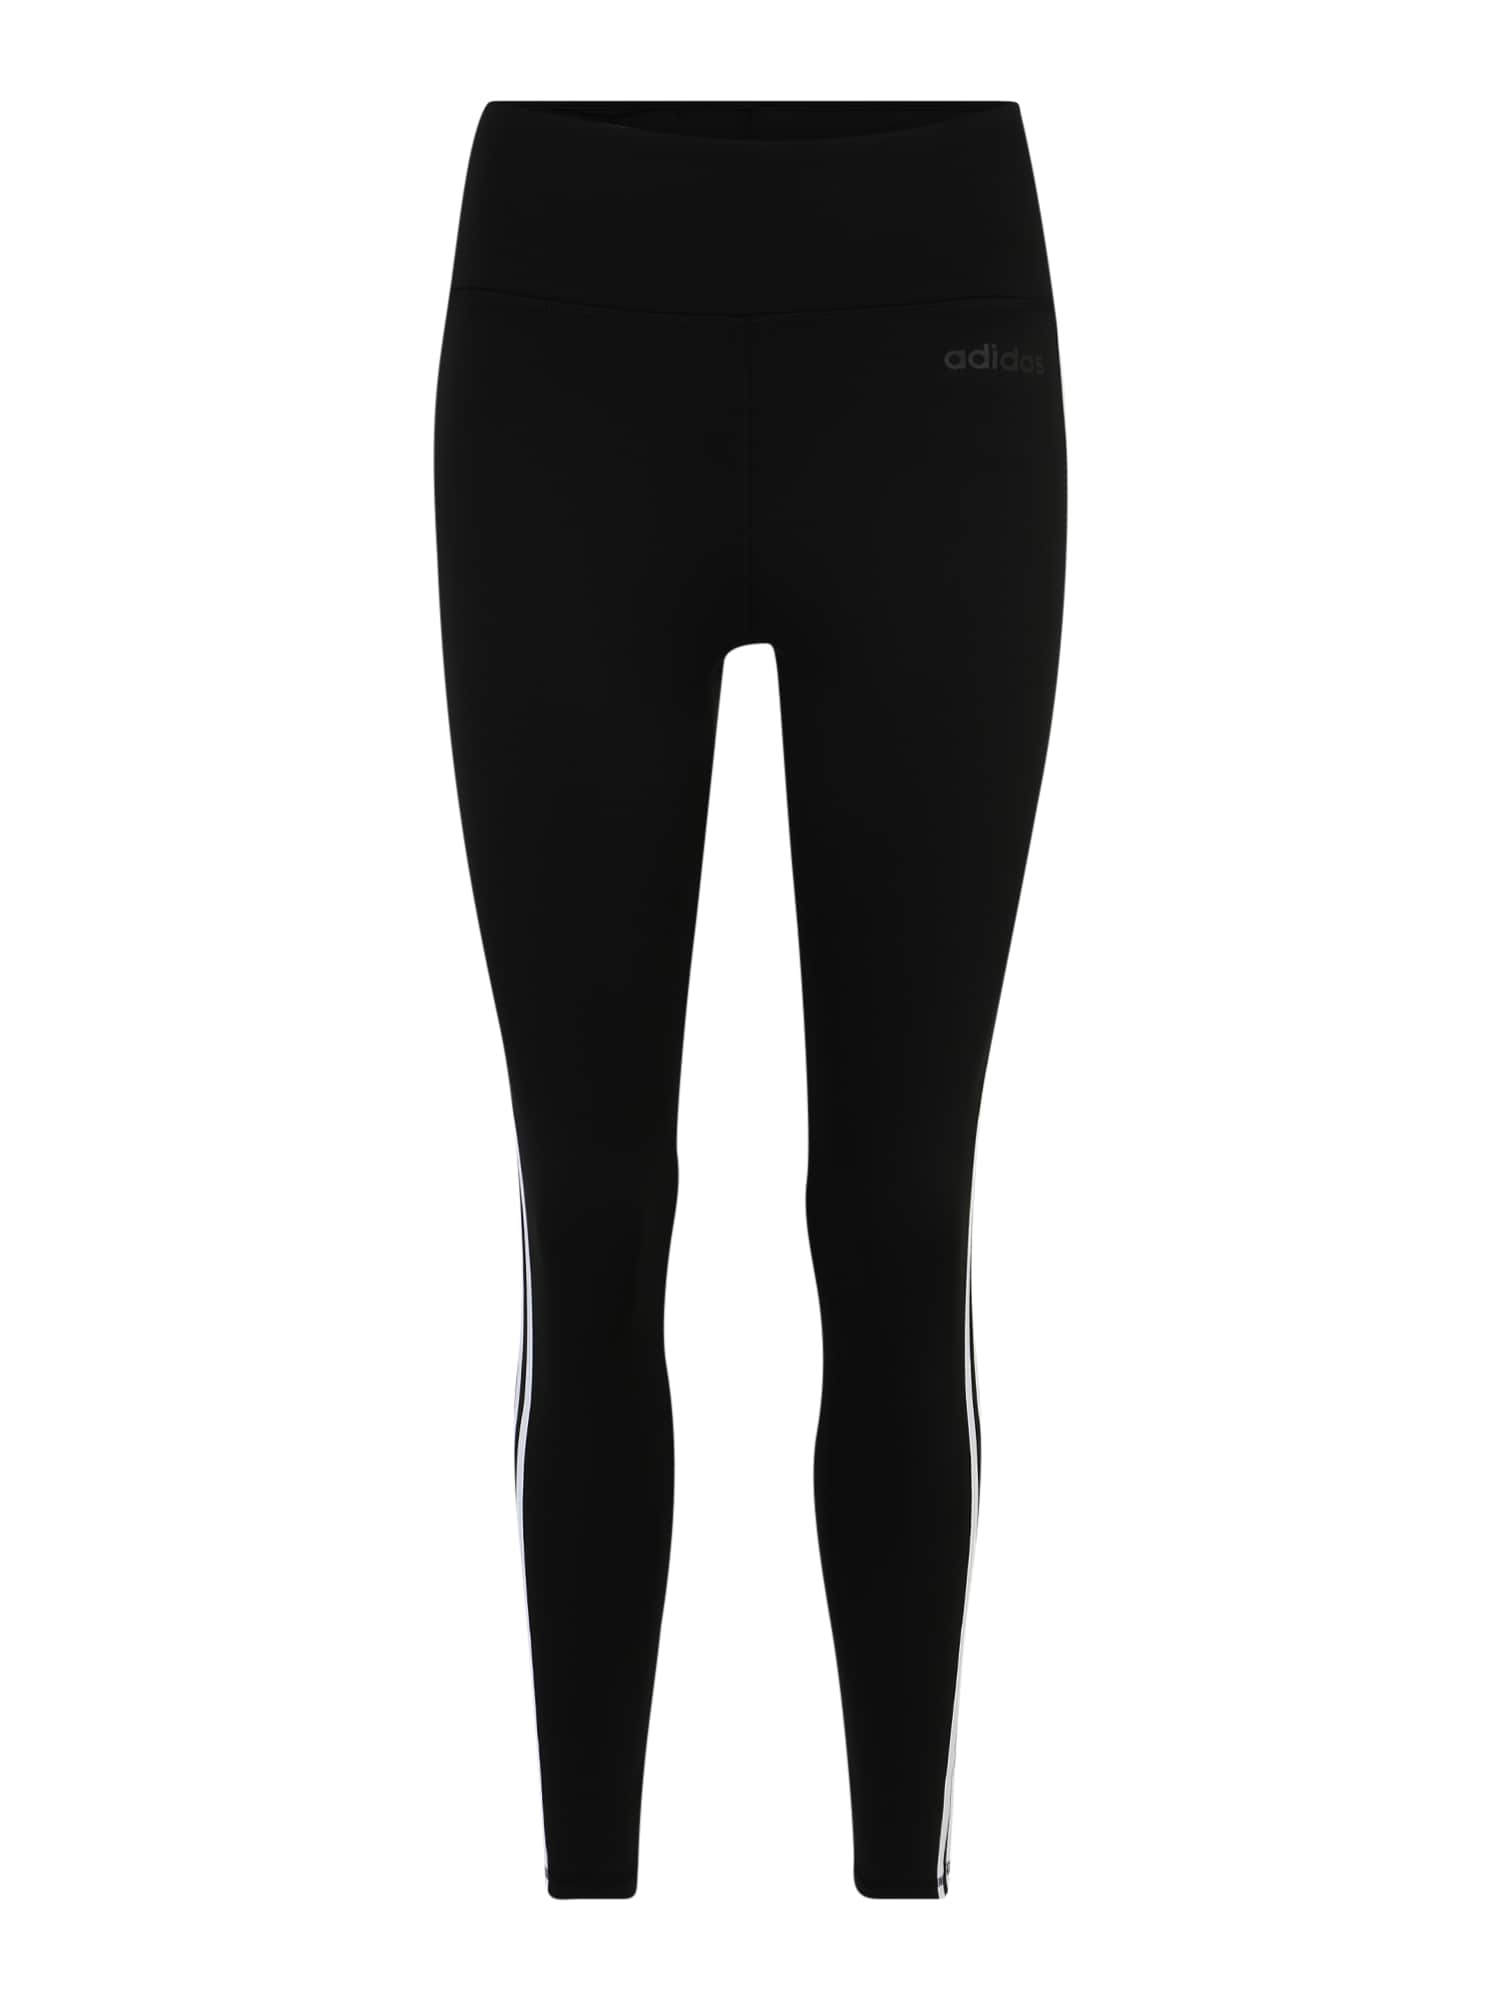 ADIDAS PERFORMANCE Sportinės kelnės 'W D2M 3S HR LT' balta / juoda